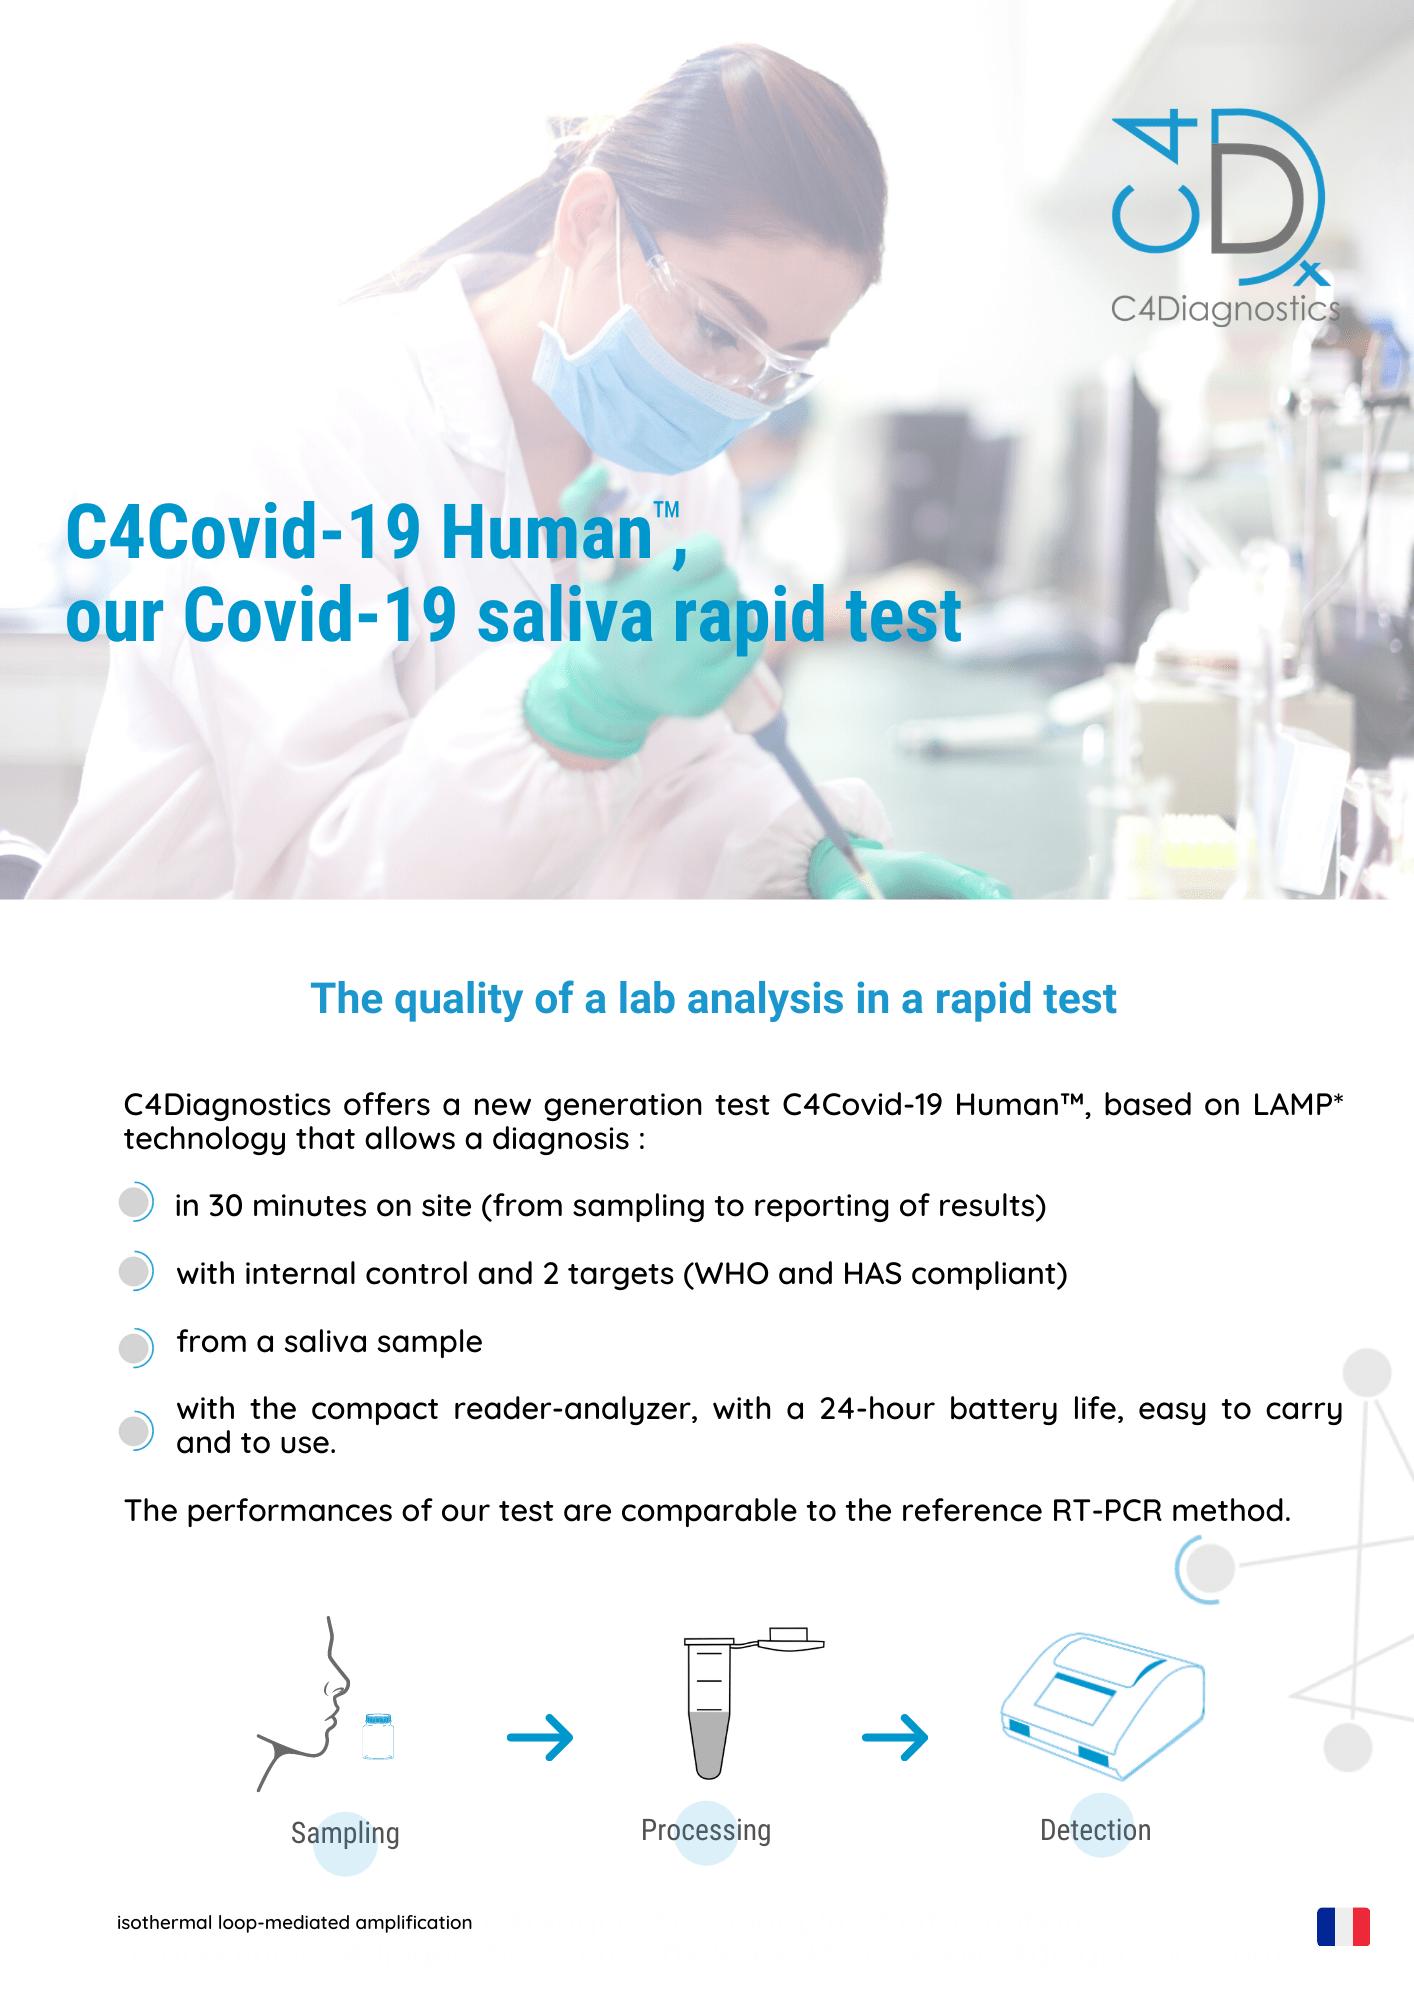 C4Covid-19 Human, our salivary test